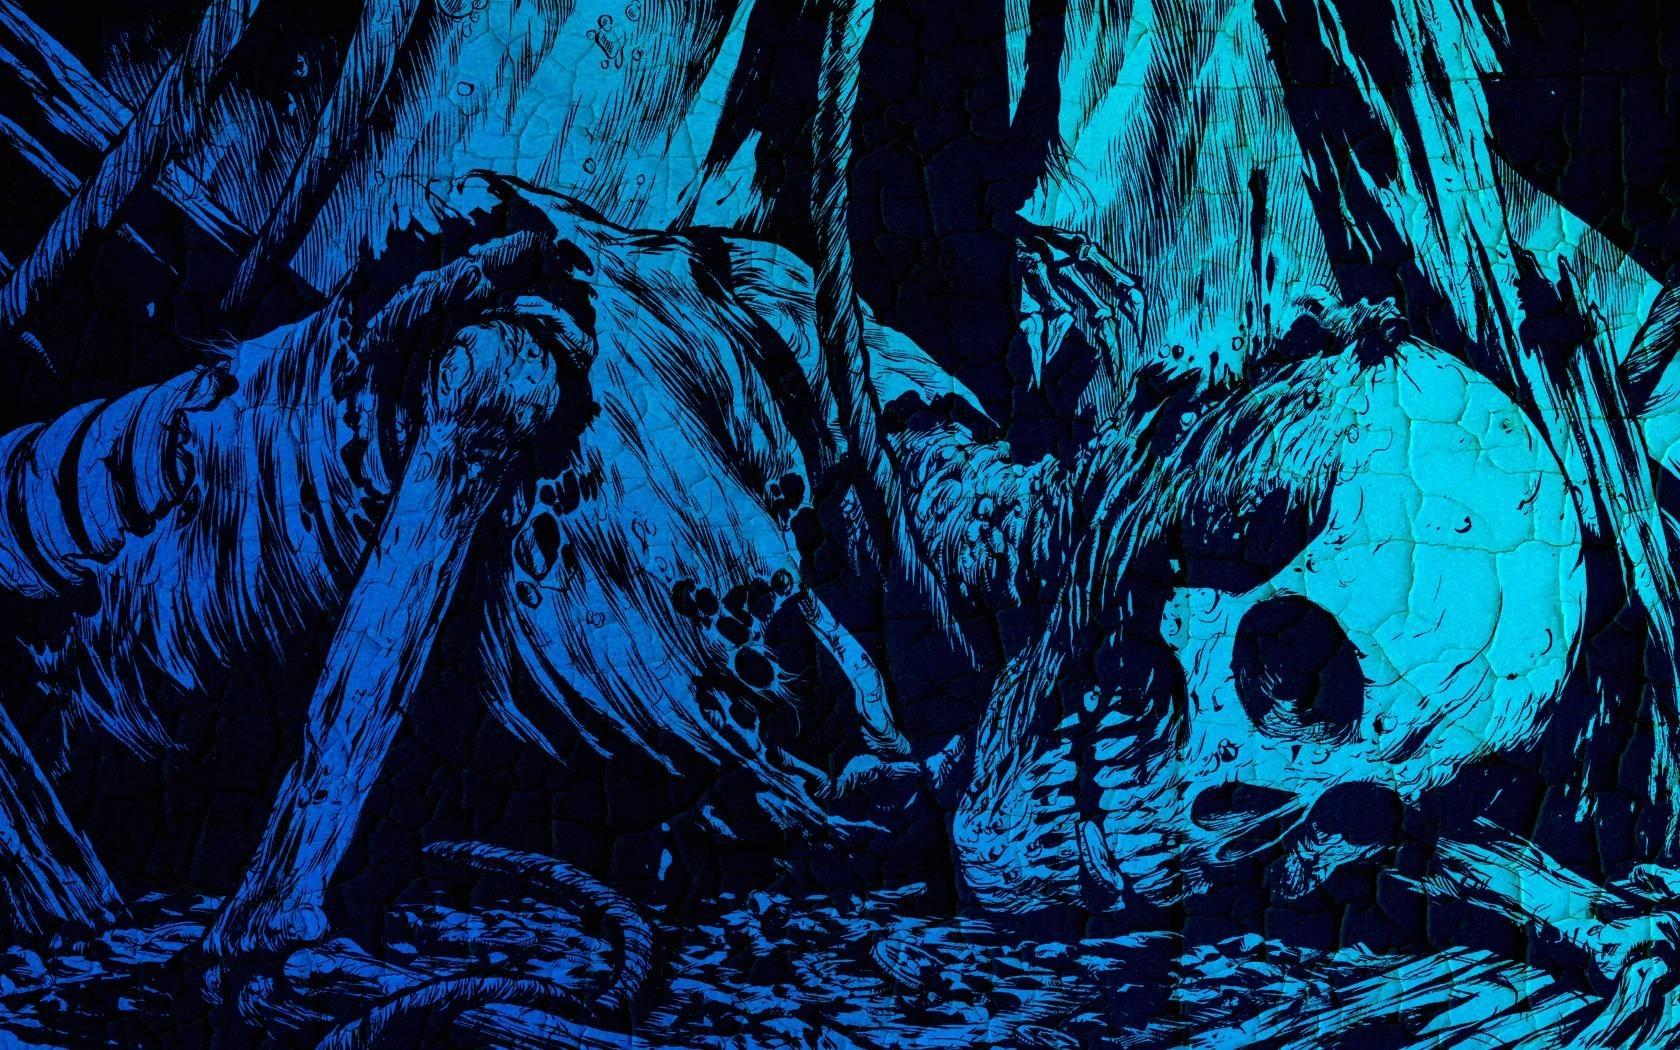 Title Skulls And Bones Wallpapers Wallpaper Cave Dimension 1680 X 1050 File Type JPG JPEG